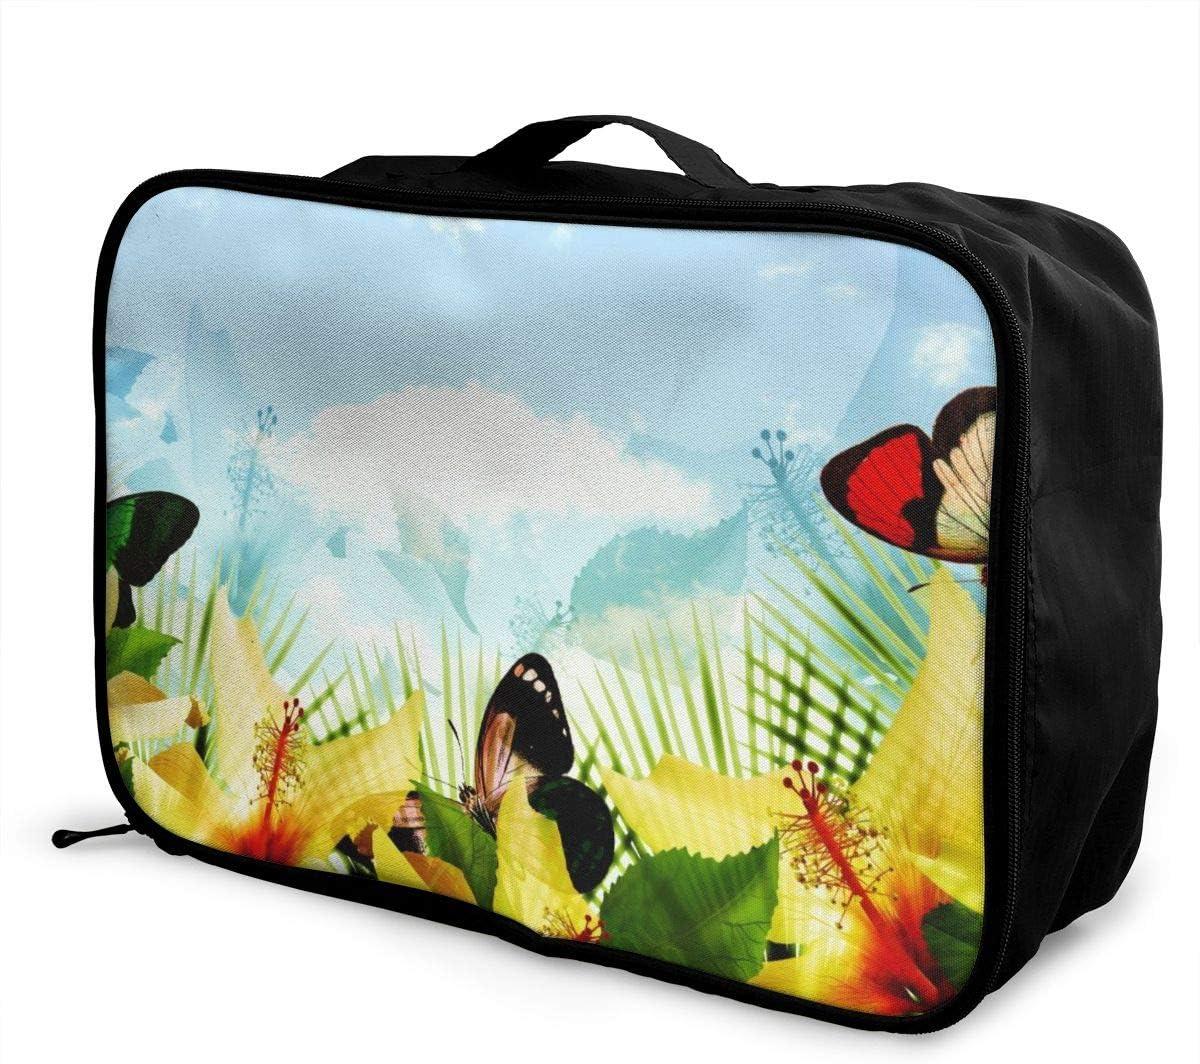 Yunshm Flower And Leaf Purple Trolley Handbag Waterproof Unisex Large Capacity For Business Travel Storage